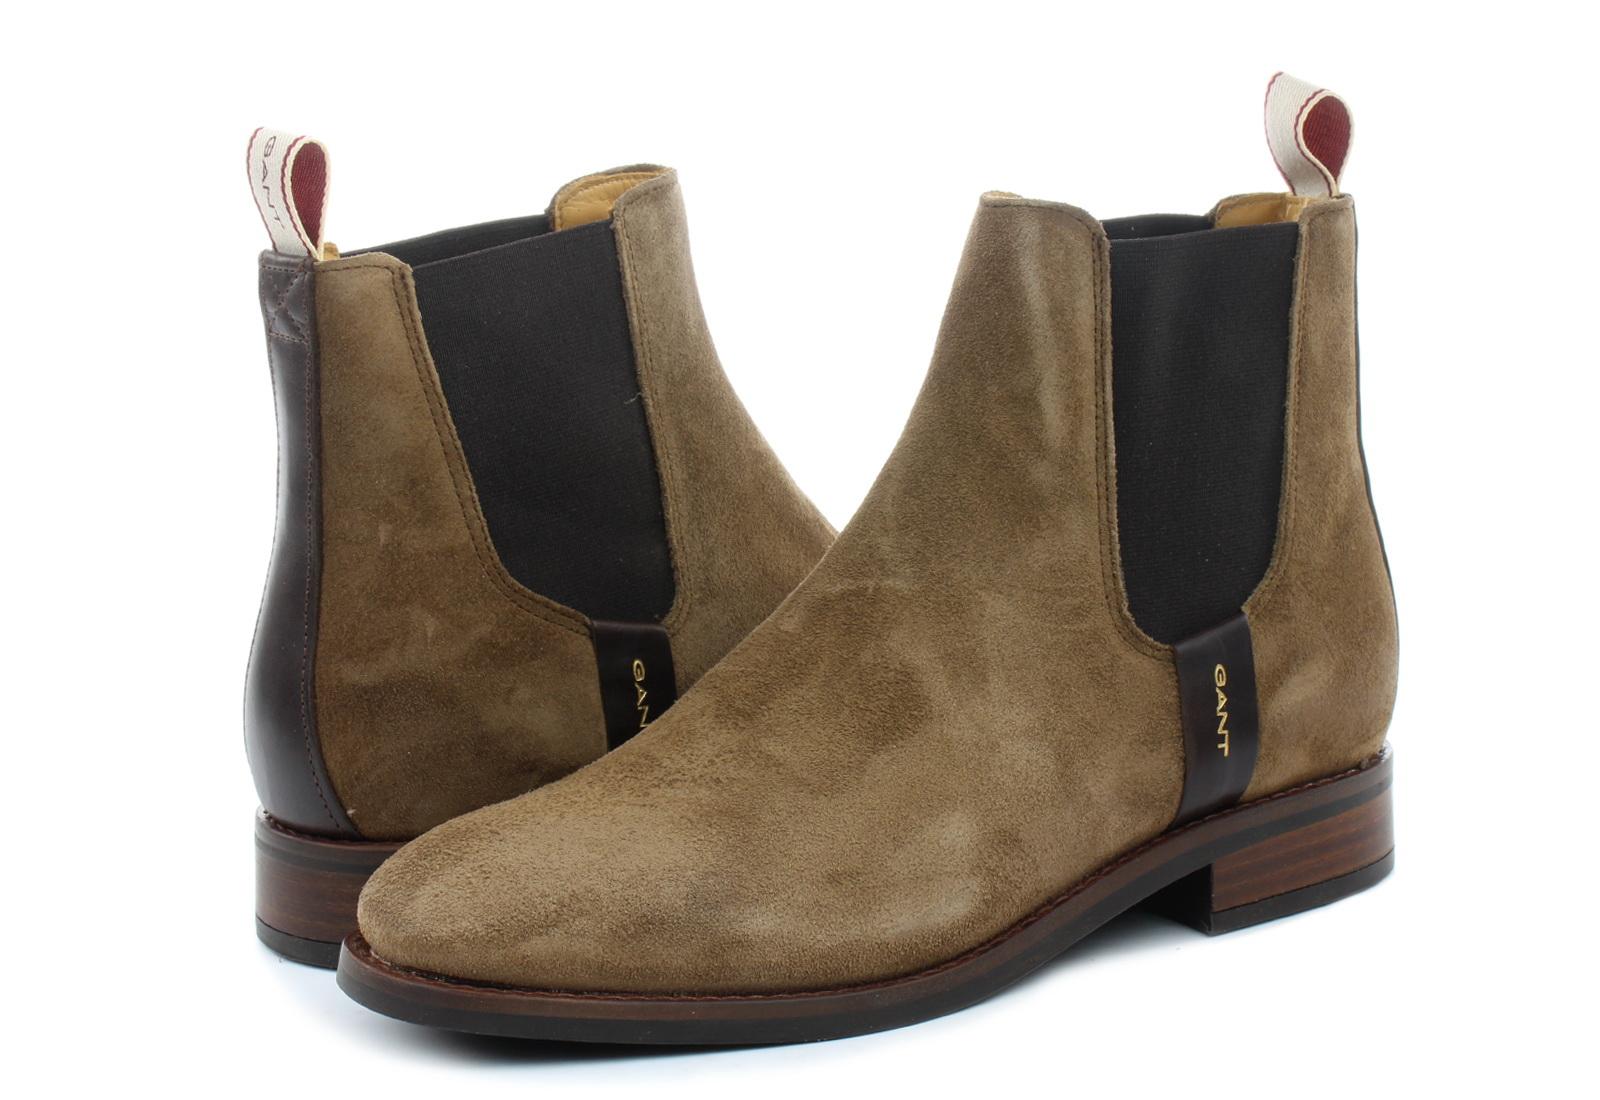 Gant Duboke cipele Fay